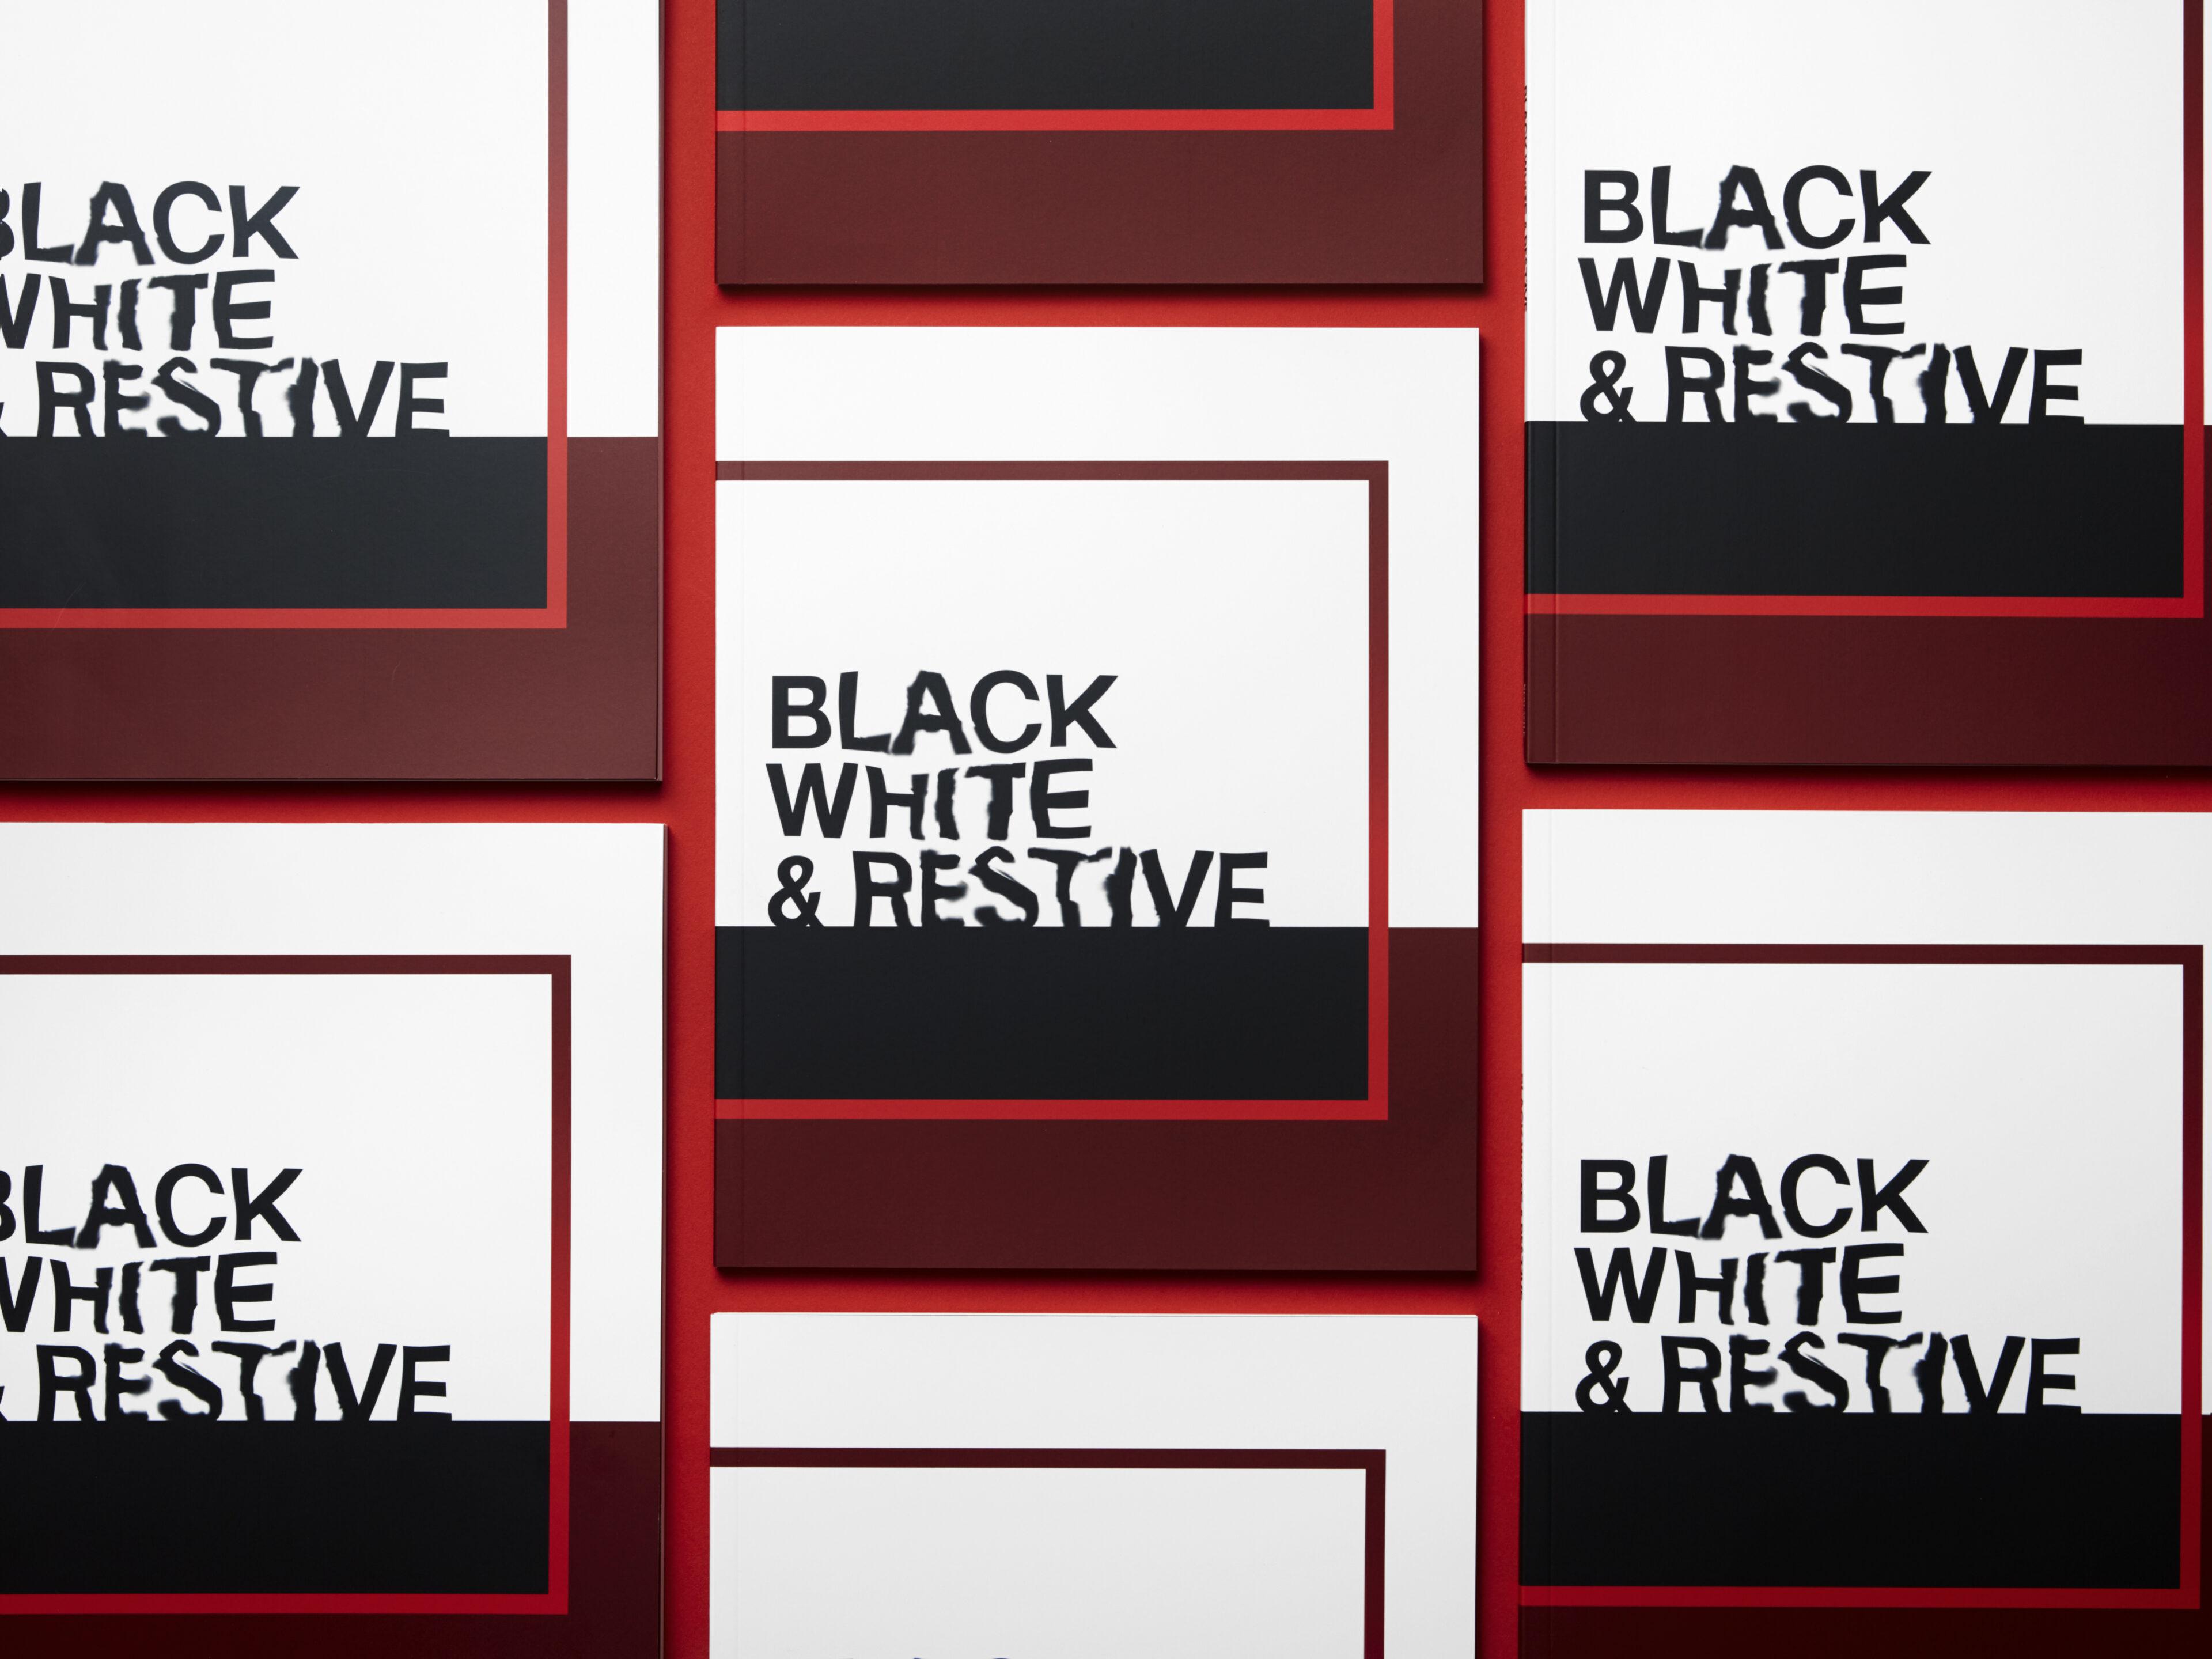 Headjam black white restive 6